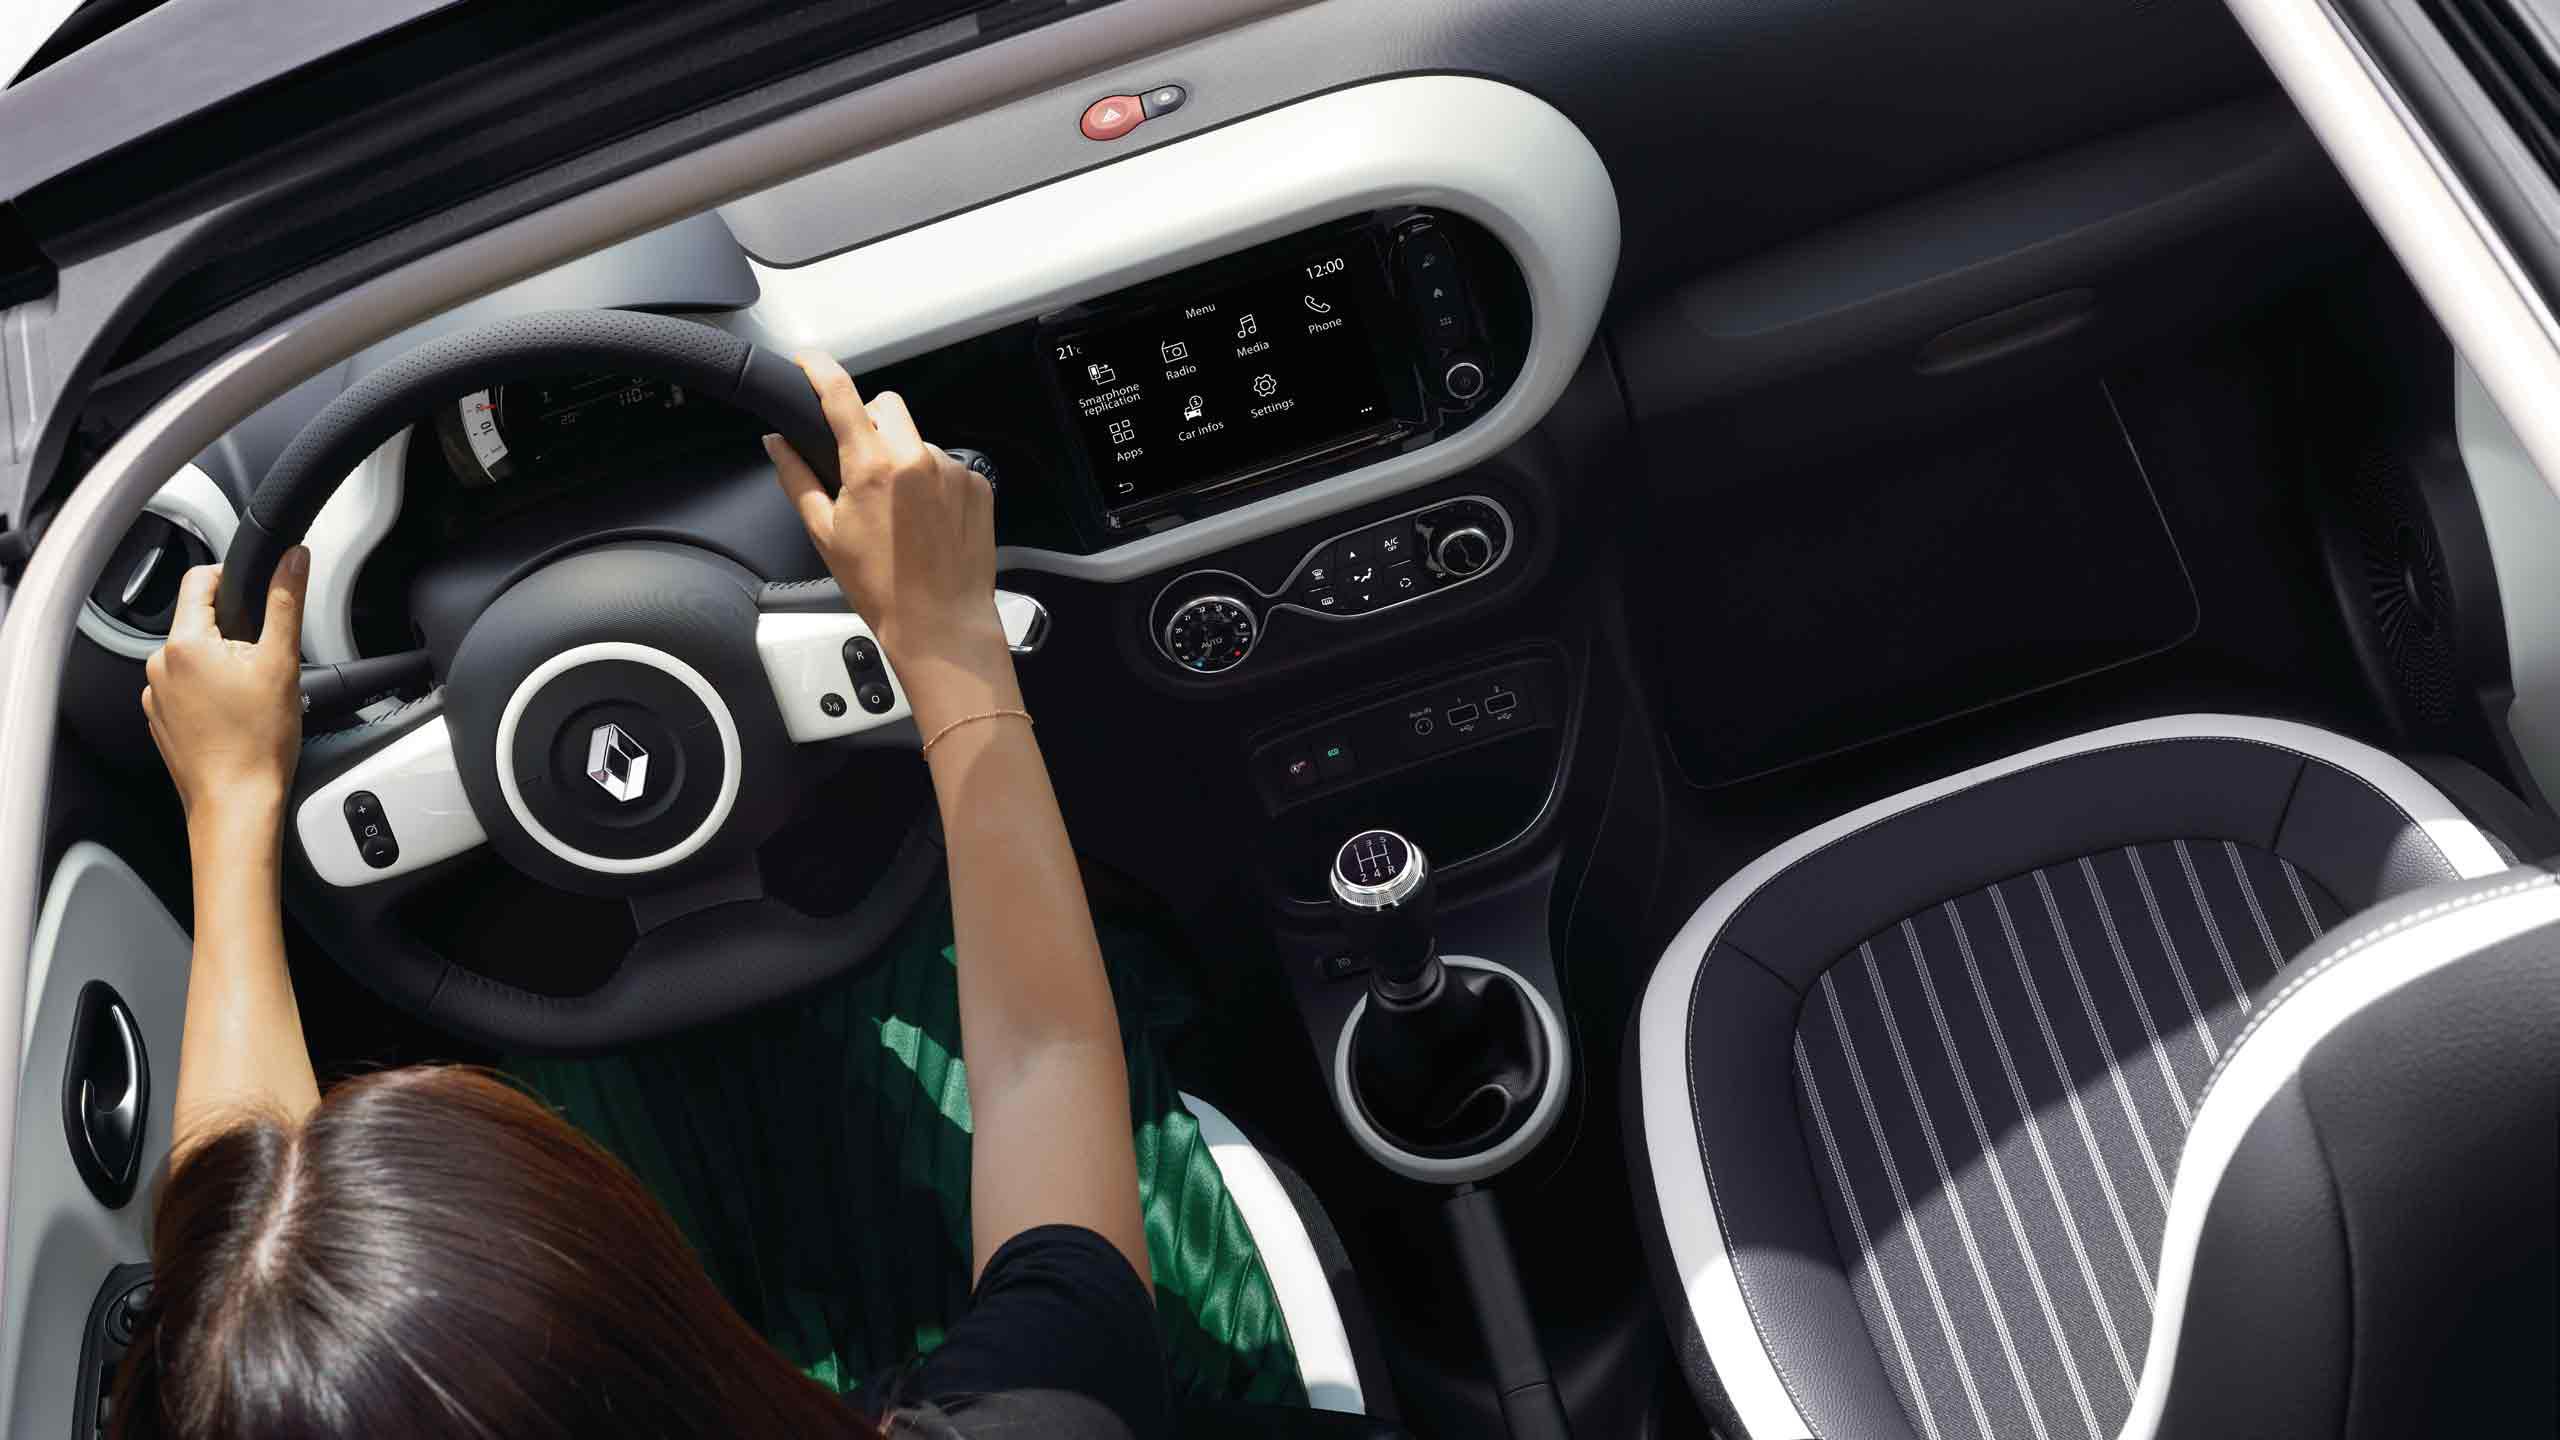 Renault Twingo Autozentren P&A-Preckel